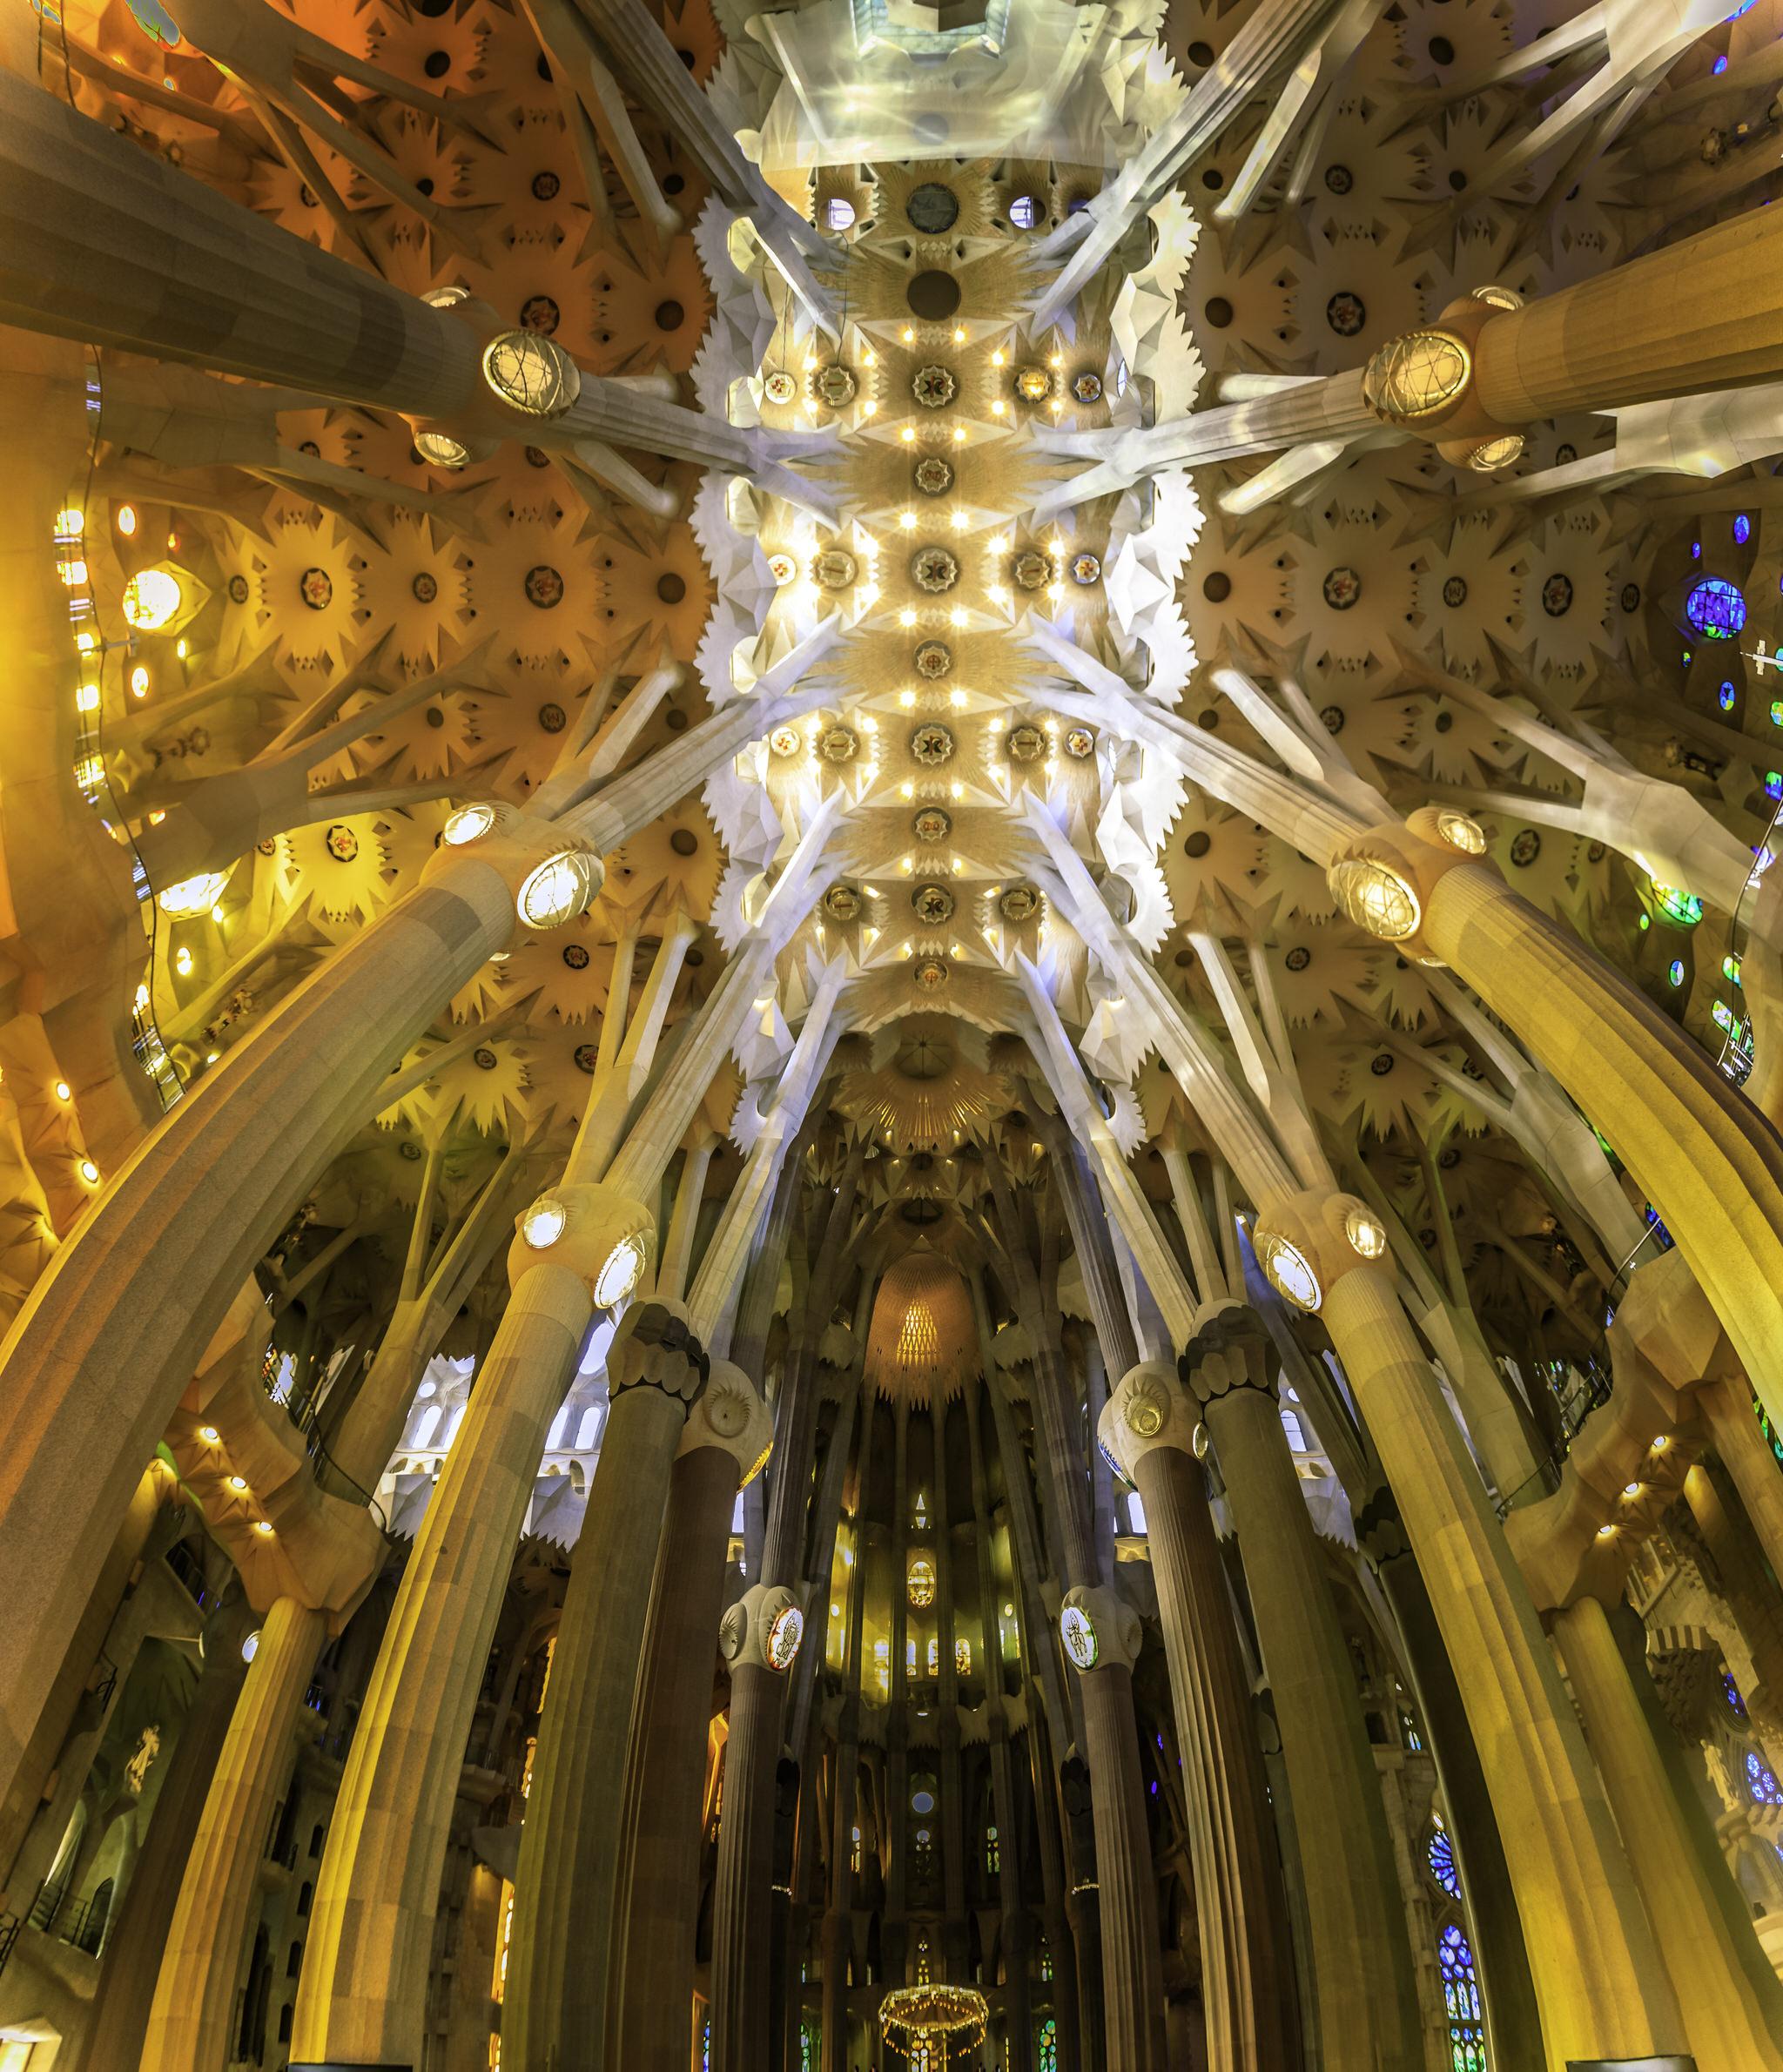 The amazing forest-like interior of the La Sagrada Familia